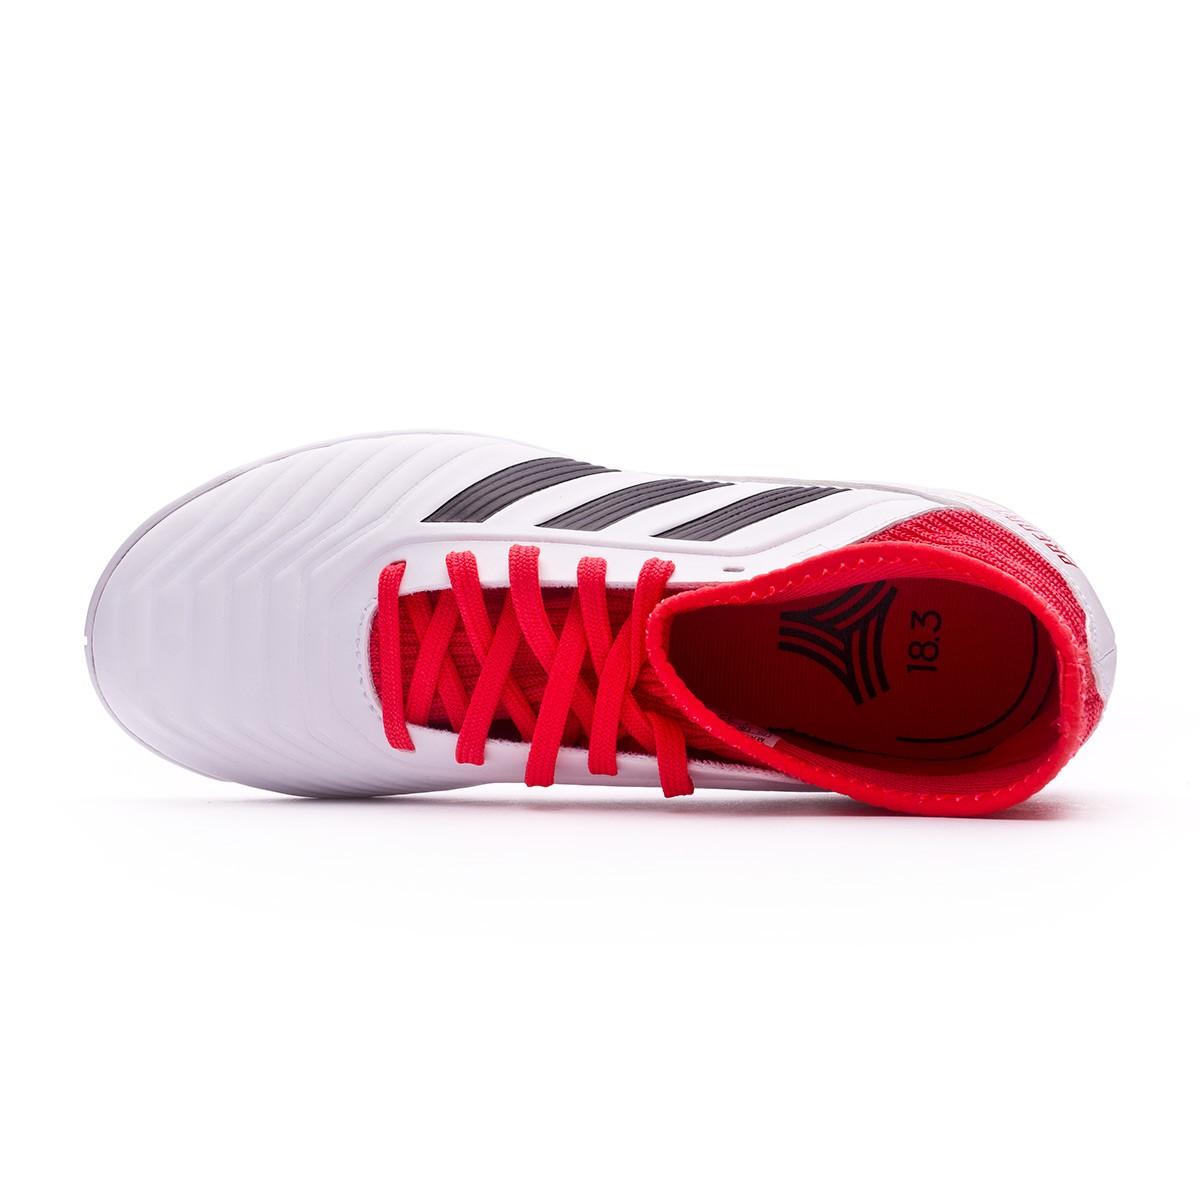 446468b9d60 Sapatilha de Futsal adidas Predator Tango 18.3 IN Crianças White-Core black-Real  coral - Loja de futebol Fútbol Emotion